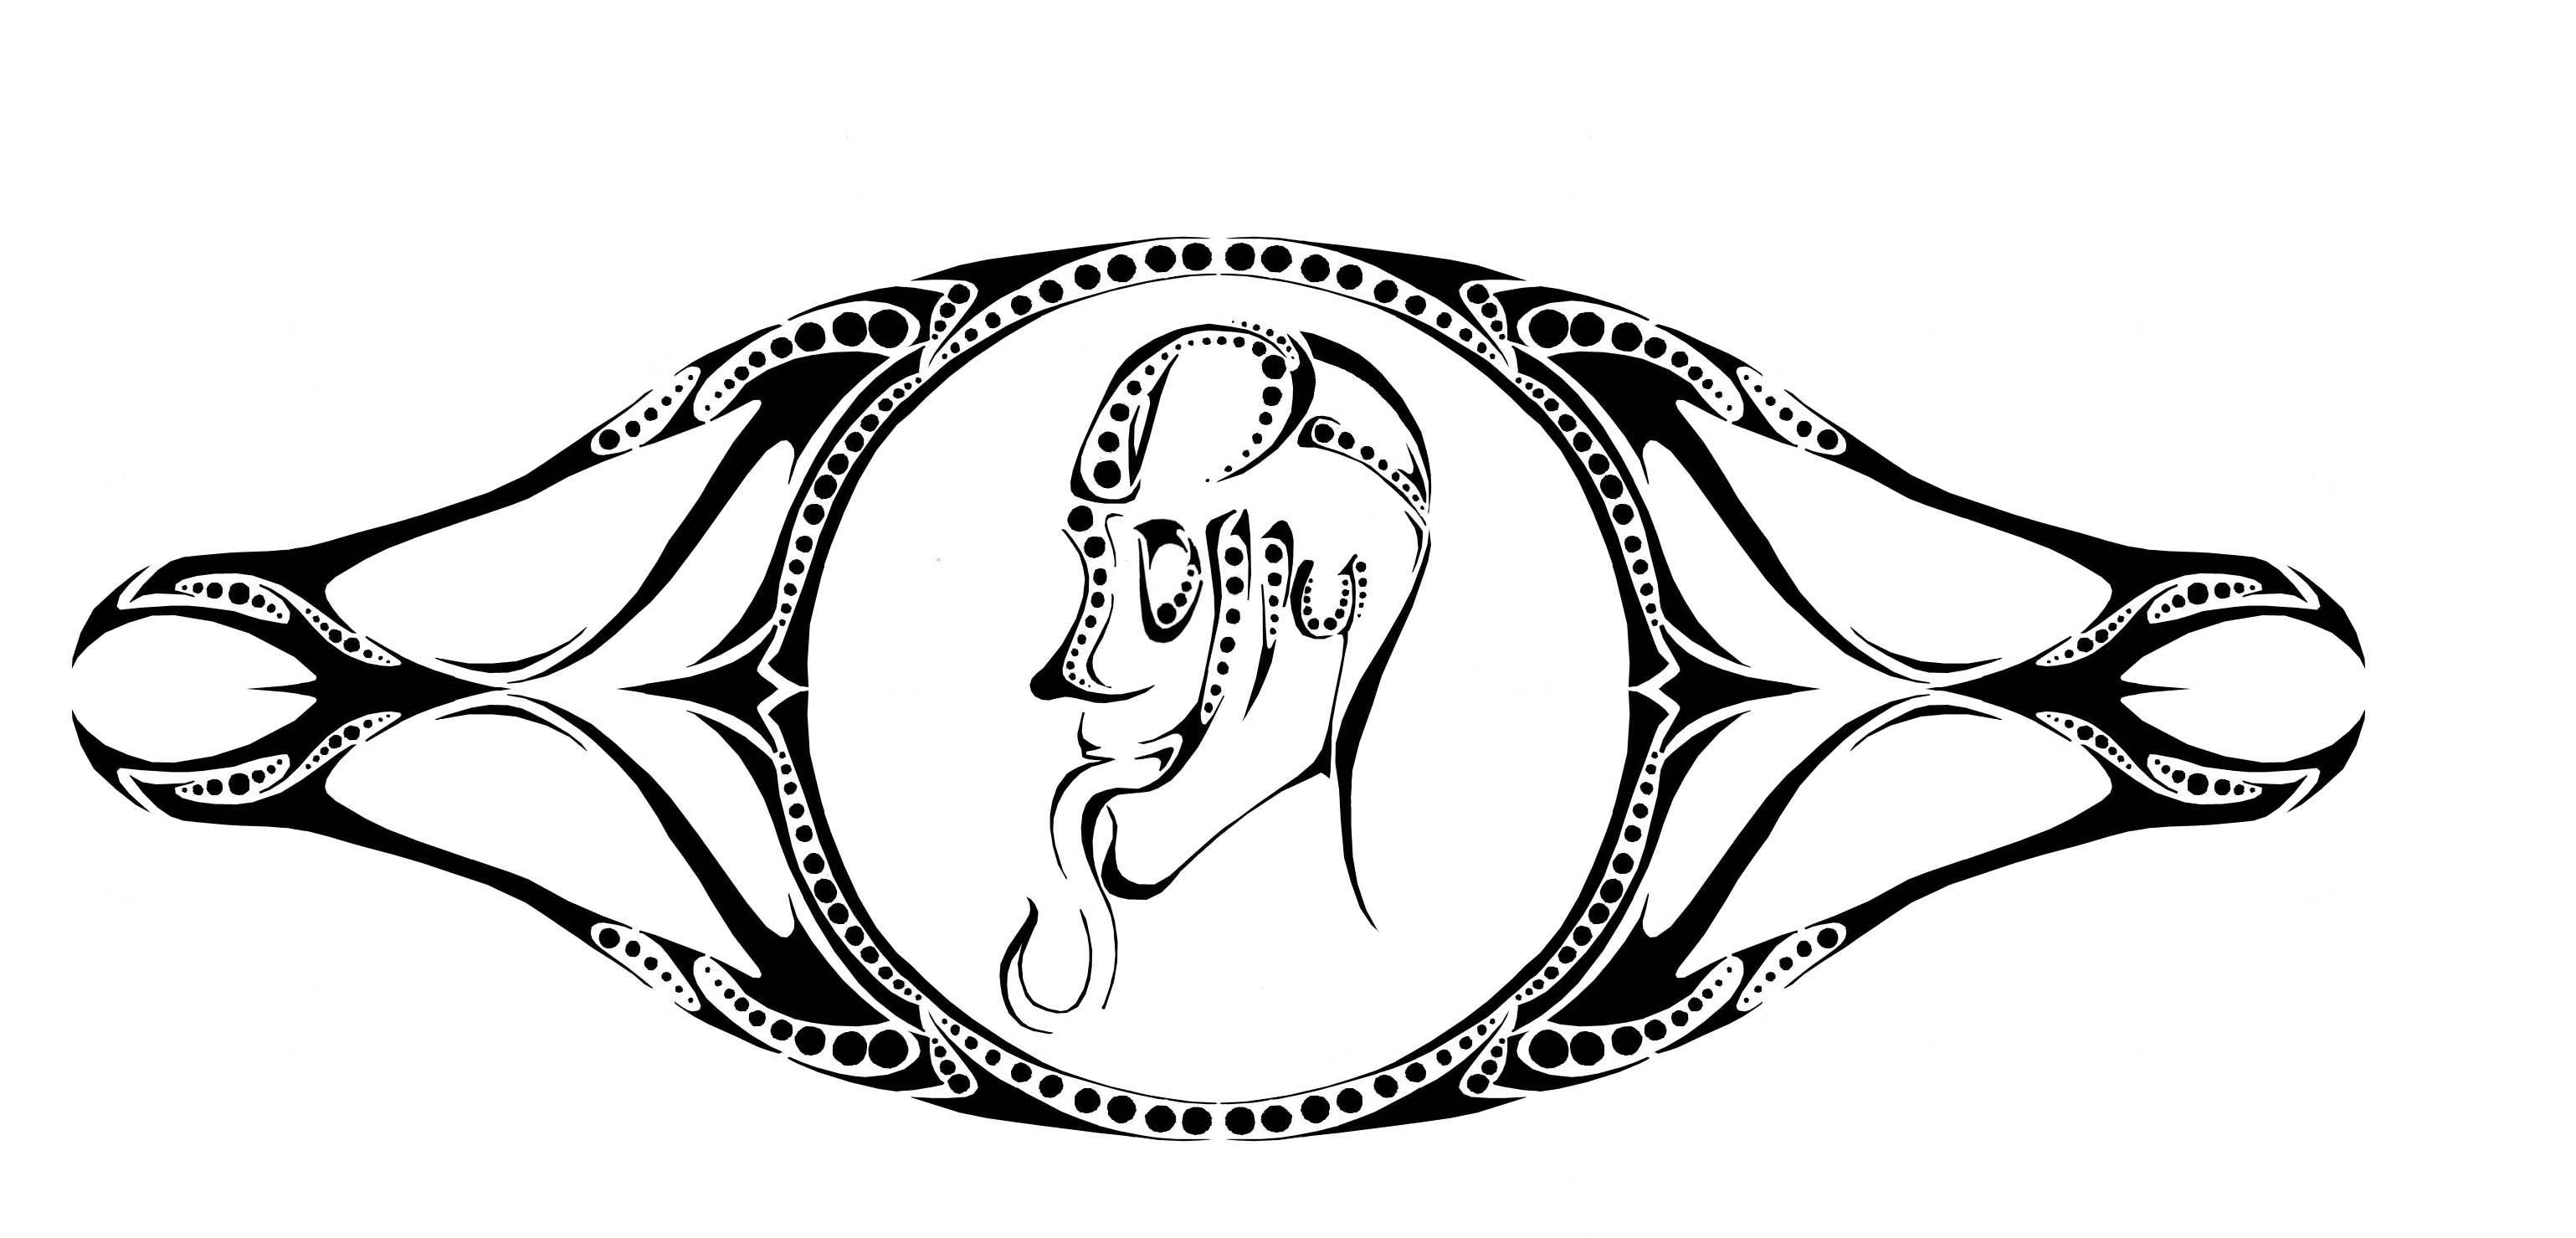 lolly tattoo 1 by dragon hacker on deviantart. Black Bedroom Furniture Sets. Home Design Ideas